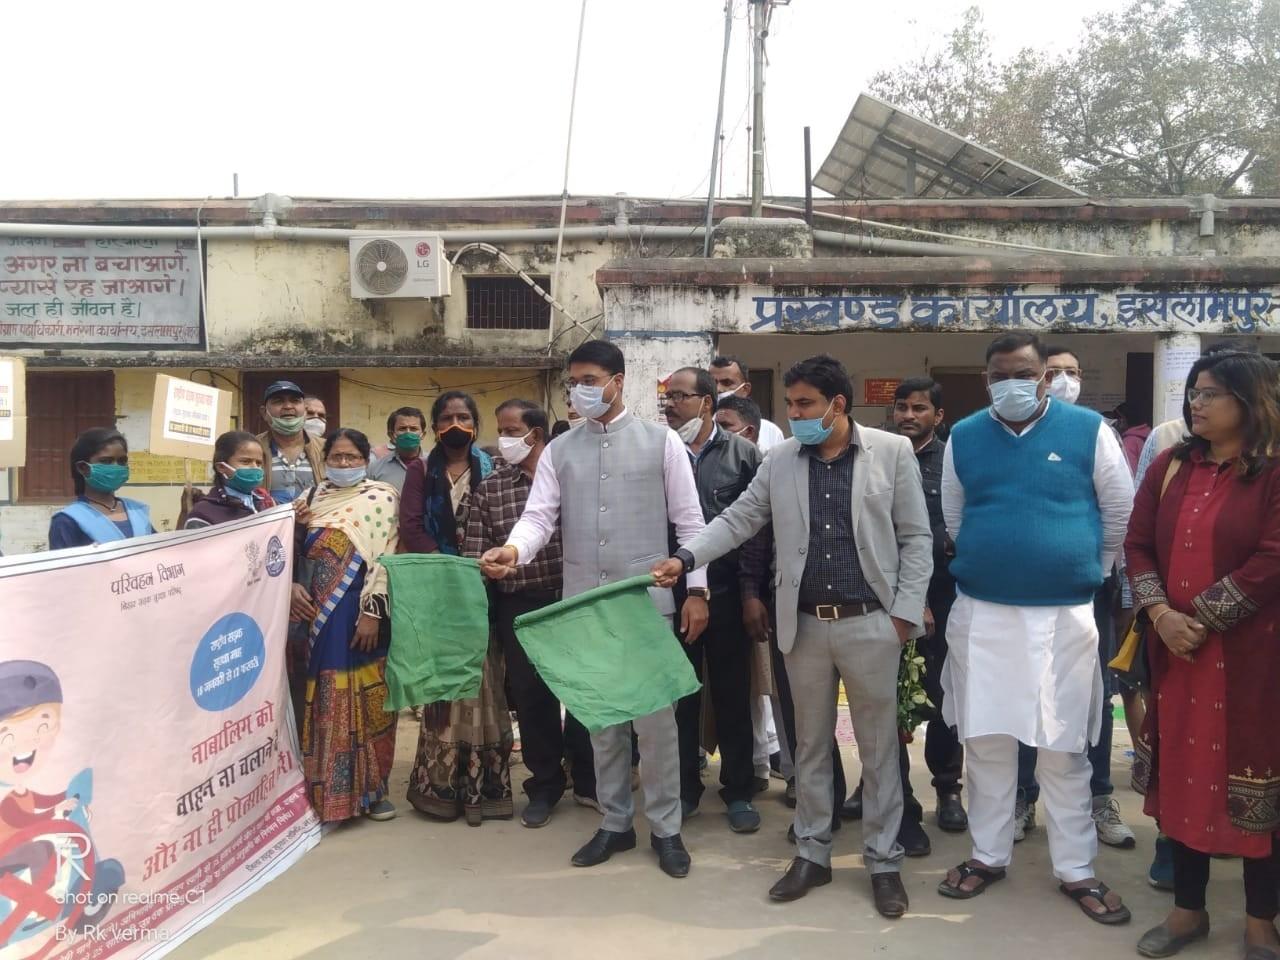 NALANDA ISLAMPUR ADMIN POLICE NEWS 3 – Nalanda Darpan / नालंदा दर्पण : गाँव-जेवार की बात। – गाँव-जेवार की बात।